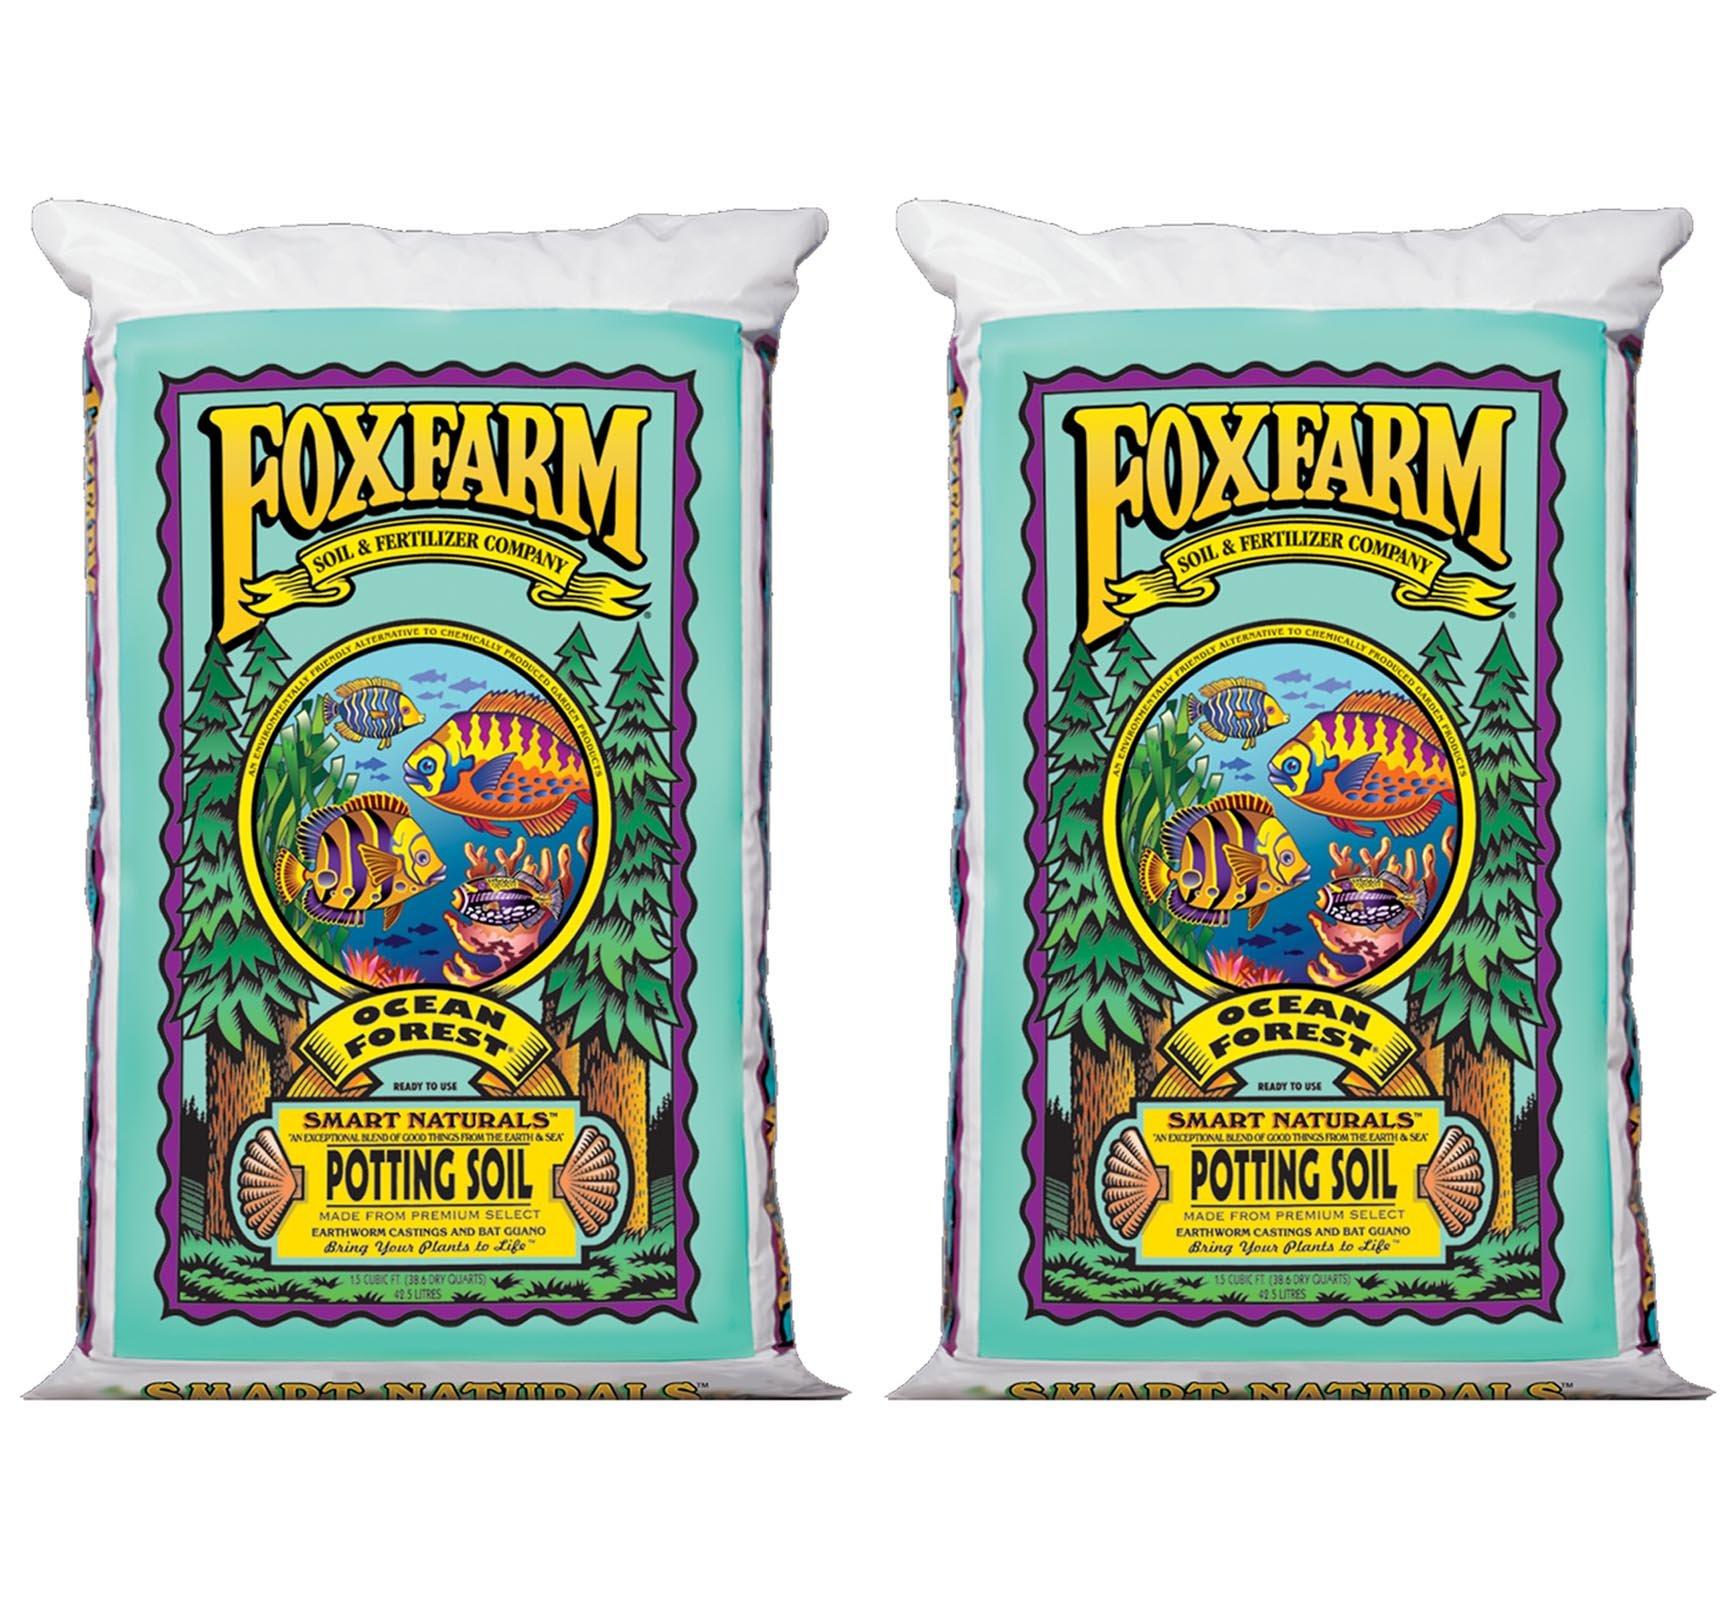 (2) Foxfarm FX14000 Ocean Forest Garden Potting Soil Bags 6.3-6.8 pH   3 Cu Ft